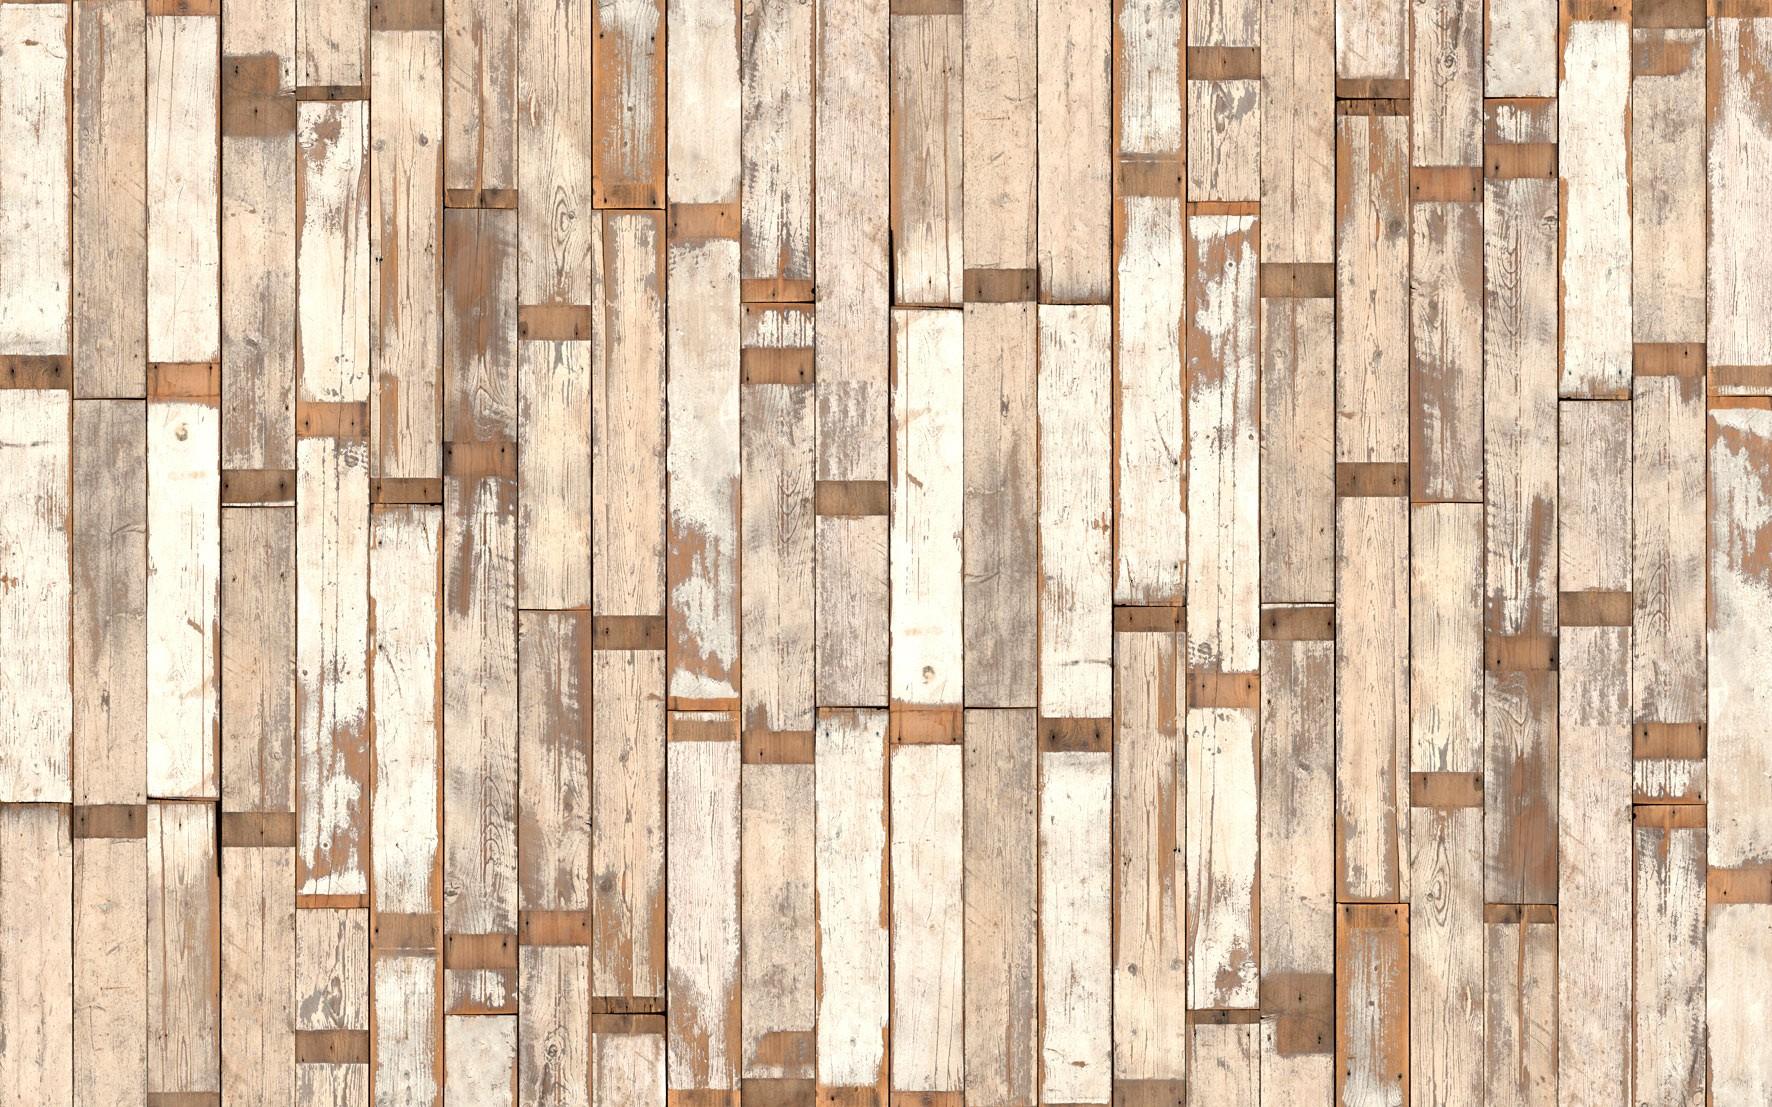 Piet hein eek scrapwood wallpaper modern wallpaper los angeles - Nlxl Scrapwood Wallpaper Topos